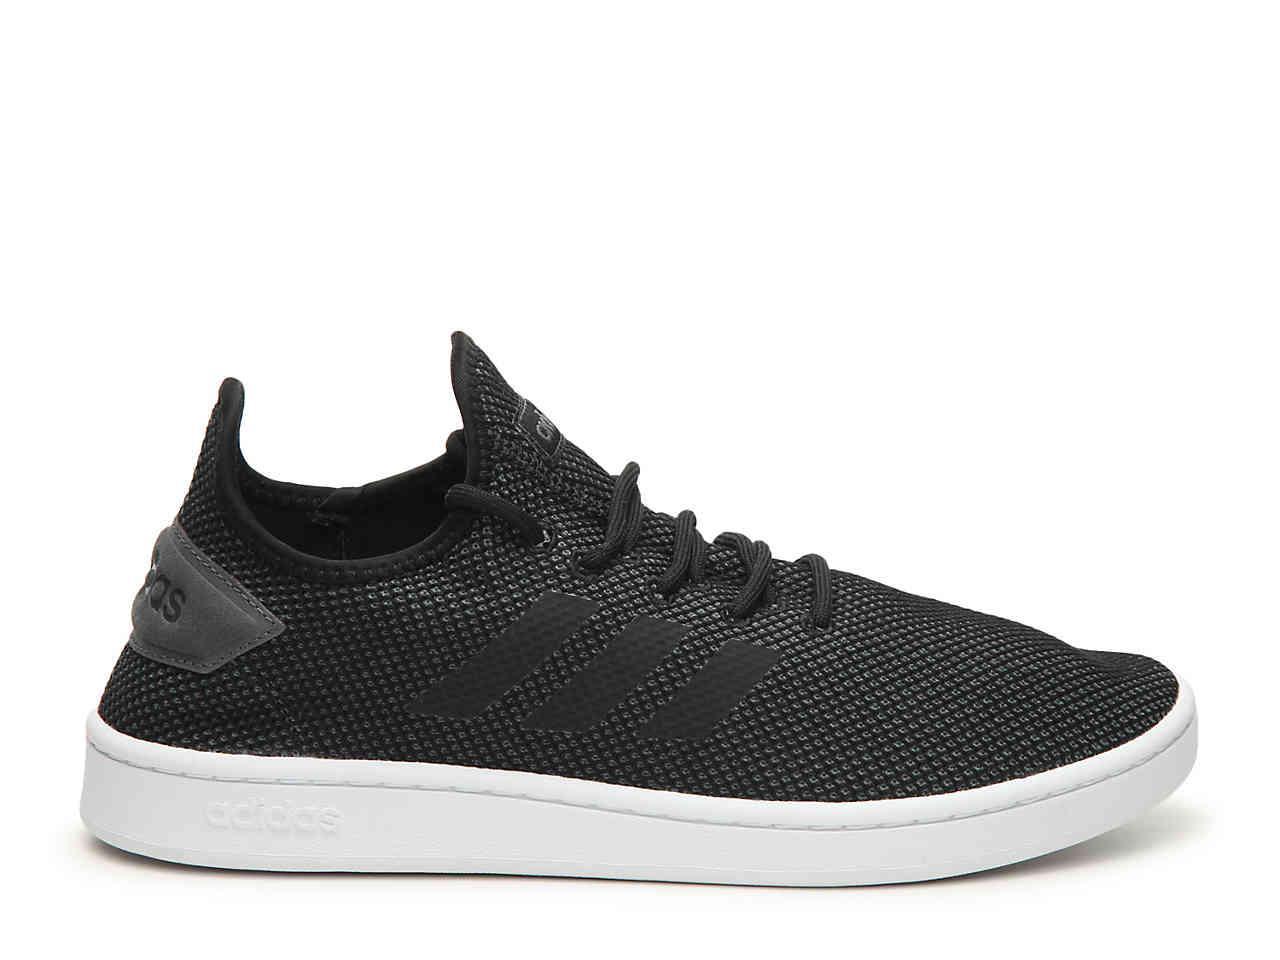 adidas Court Adapt Sneaker in Black/Grey (Black) for Men - Lyst